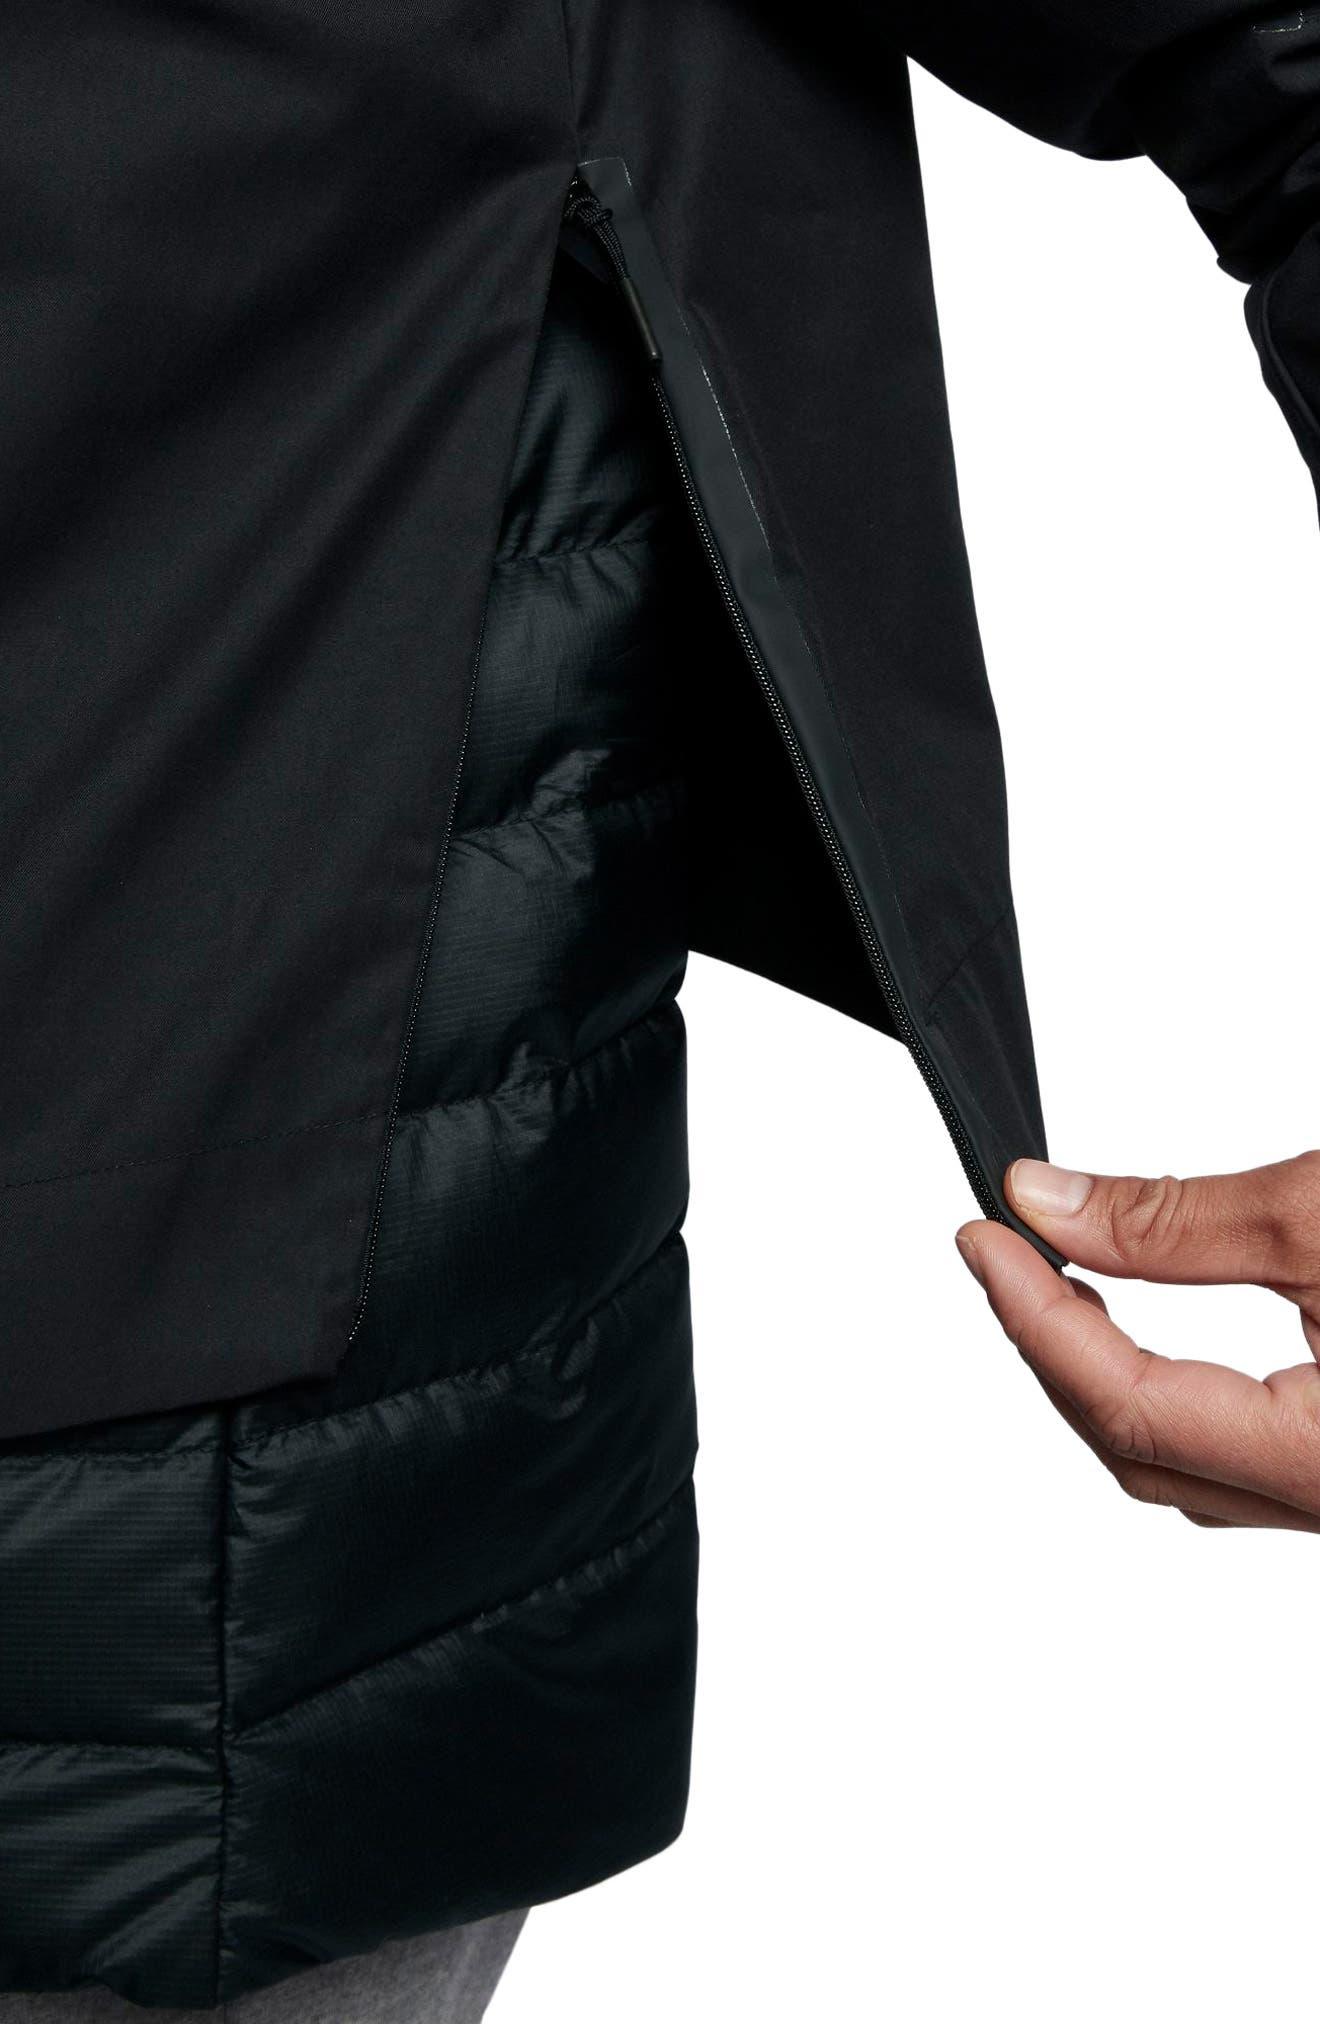 Sportswear AeroLoft 3-in-1 Down Jacket,                             Alternate thumbnail 10, color,                             Black/ Black/ Black